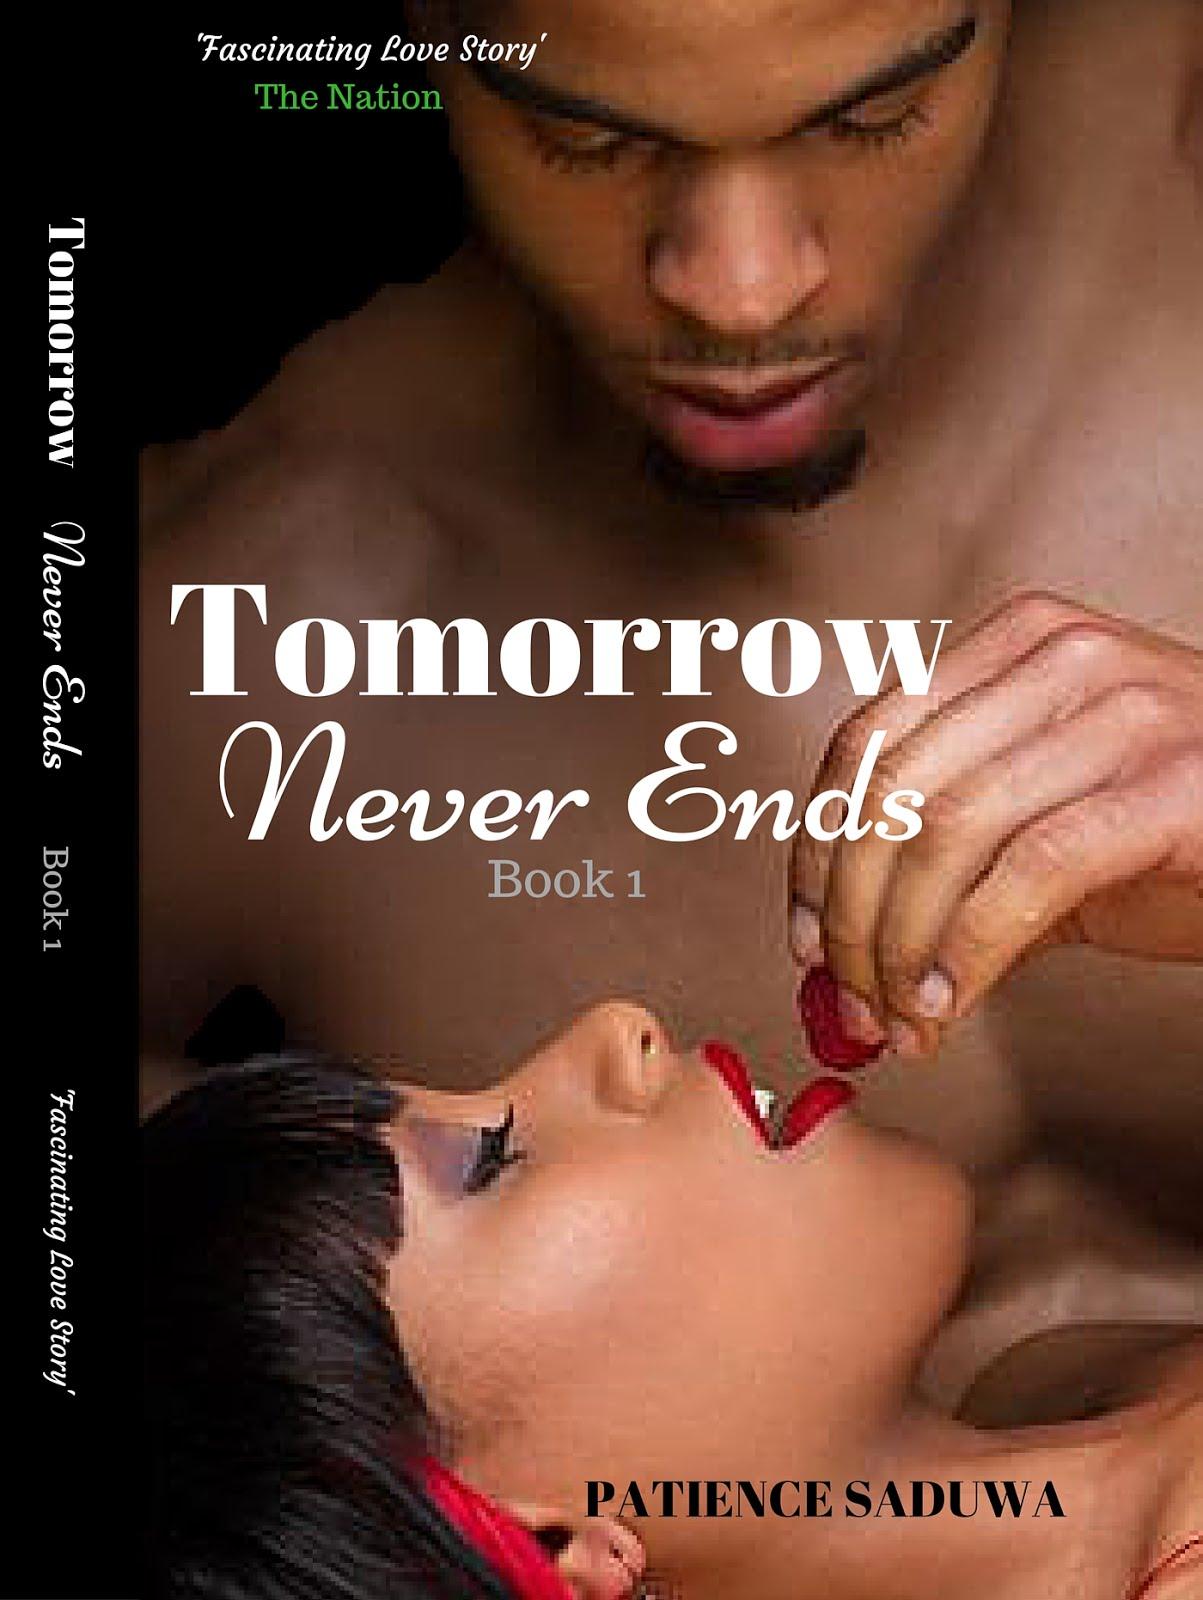 Tomorrow Never Ends by Patricia Saduwa